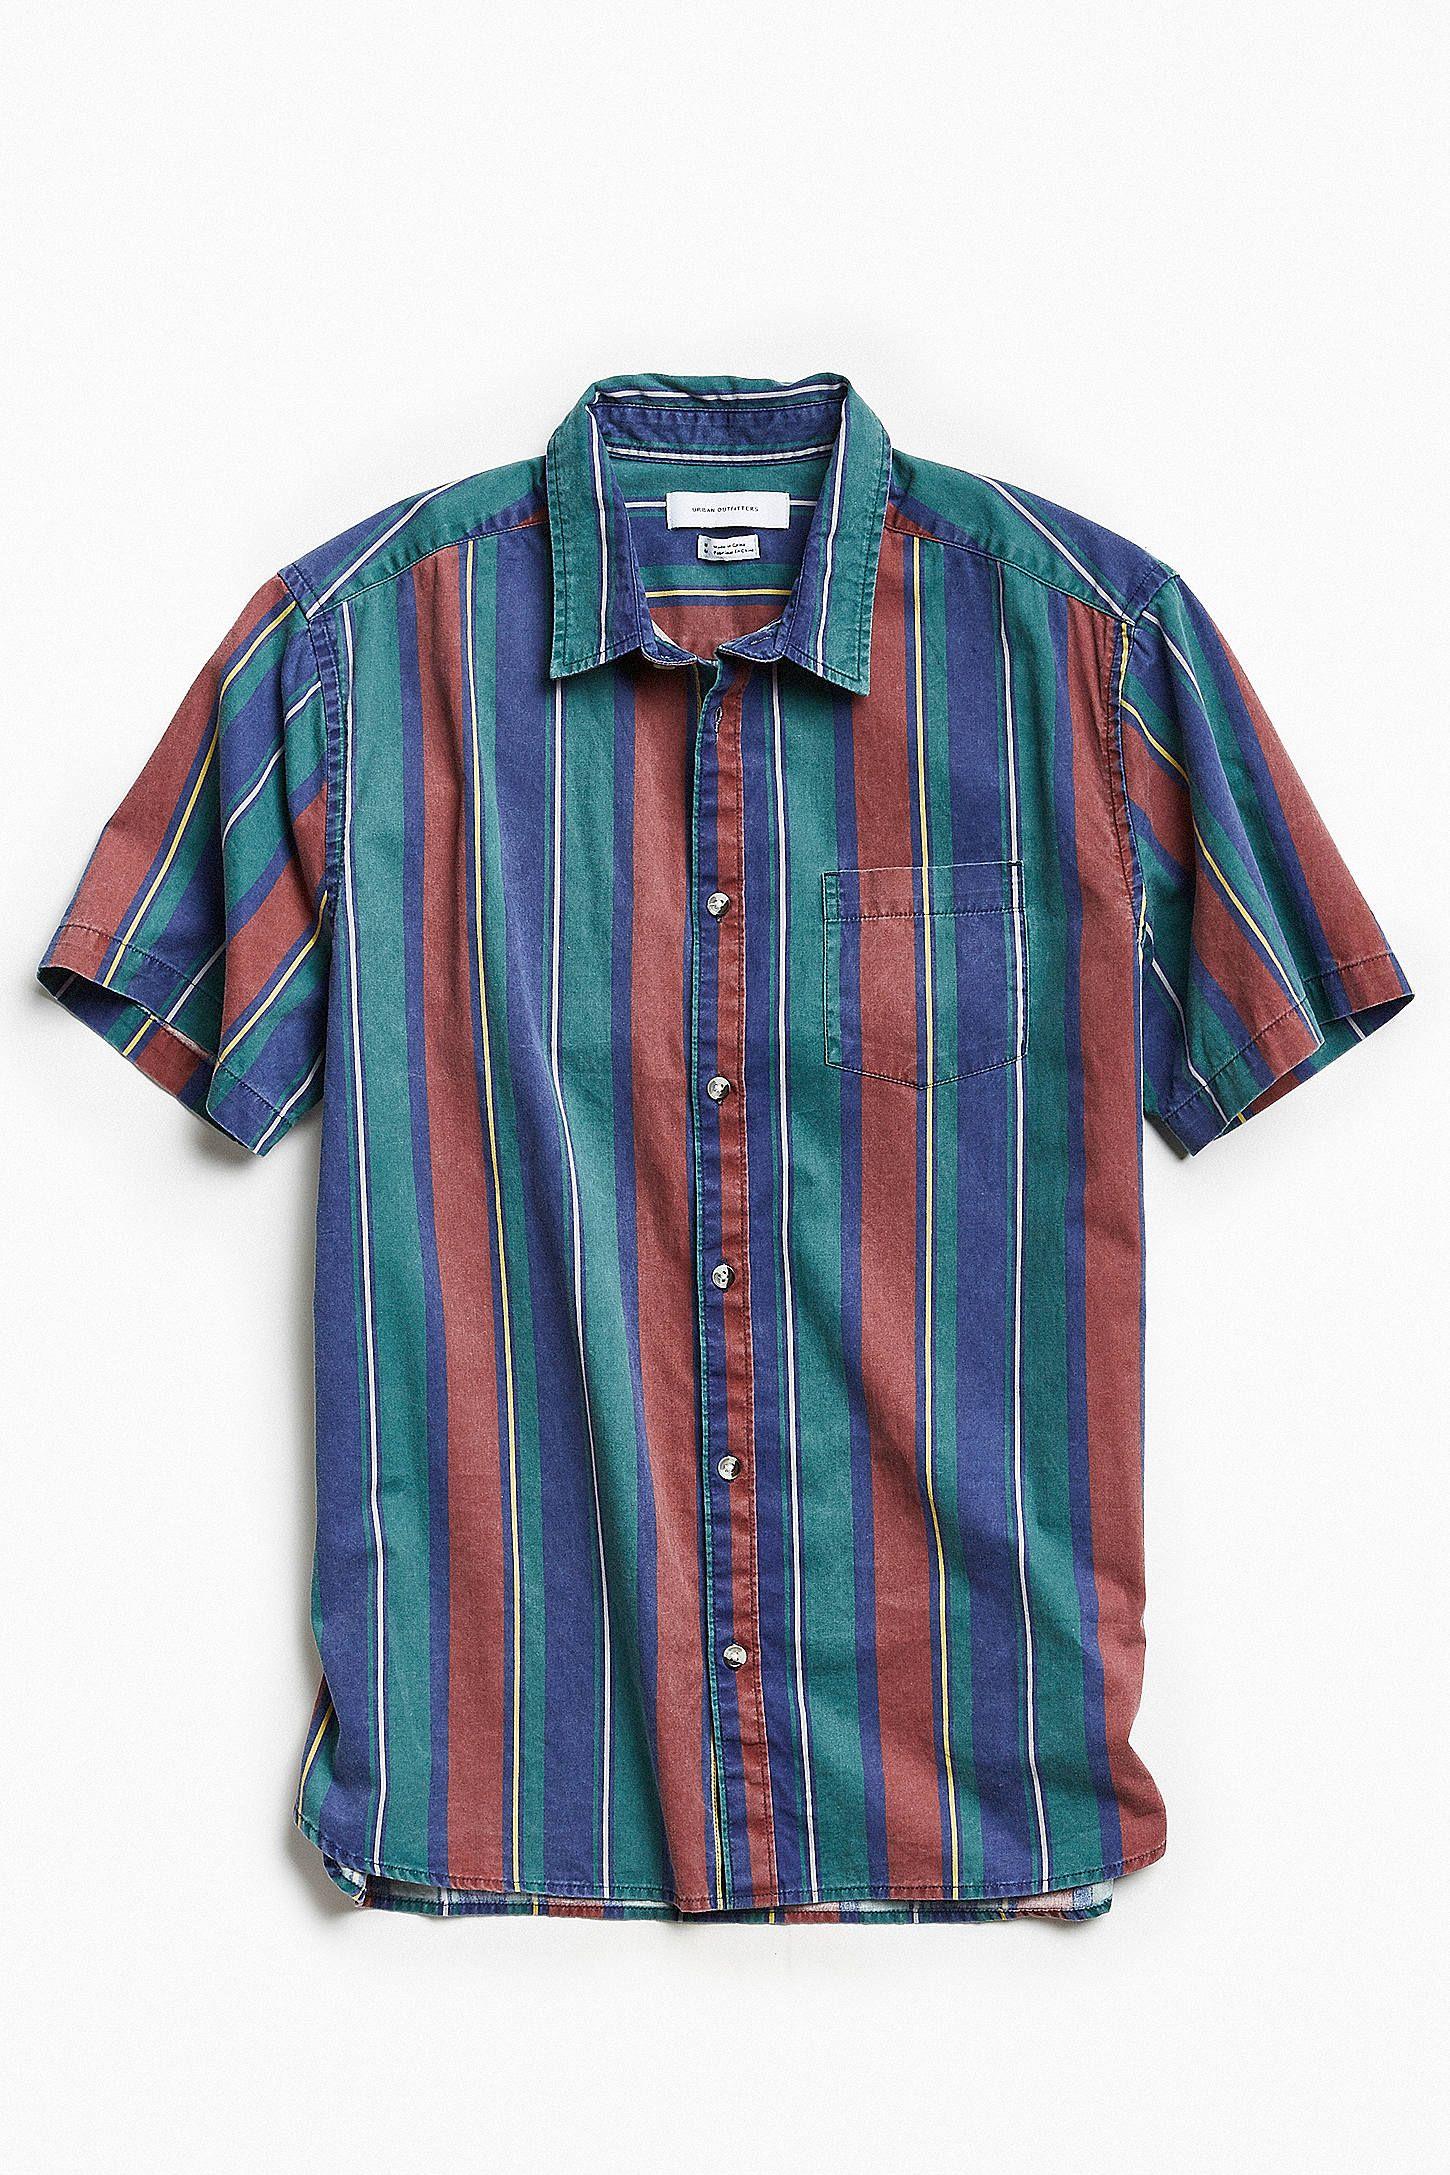 570f7e241e5 Slide View  1  UO  90s Stripe Short Sleeve Button-Down Shirt